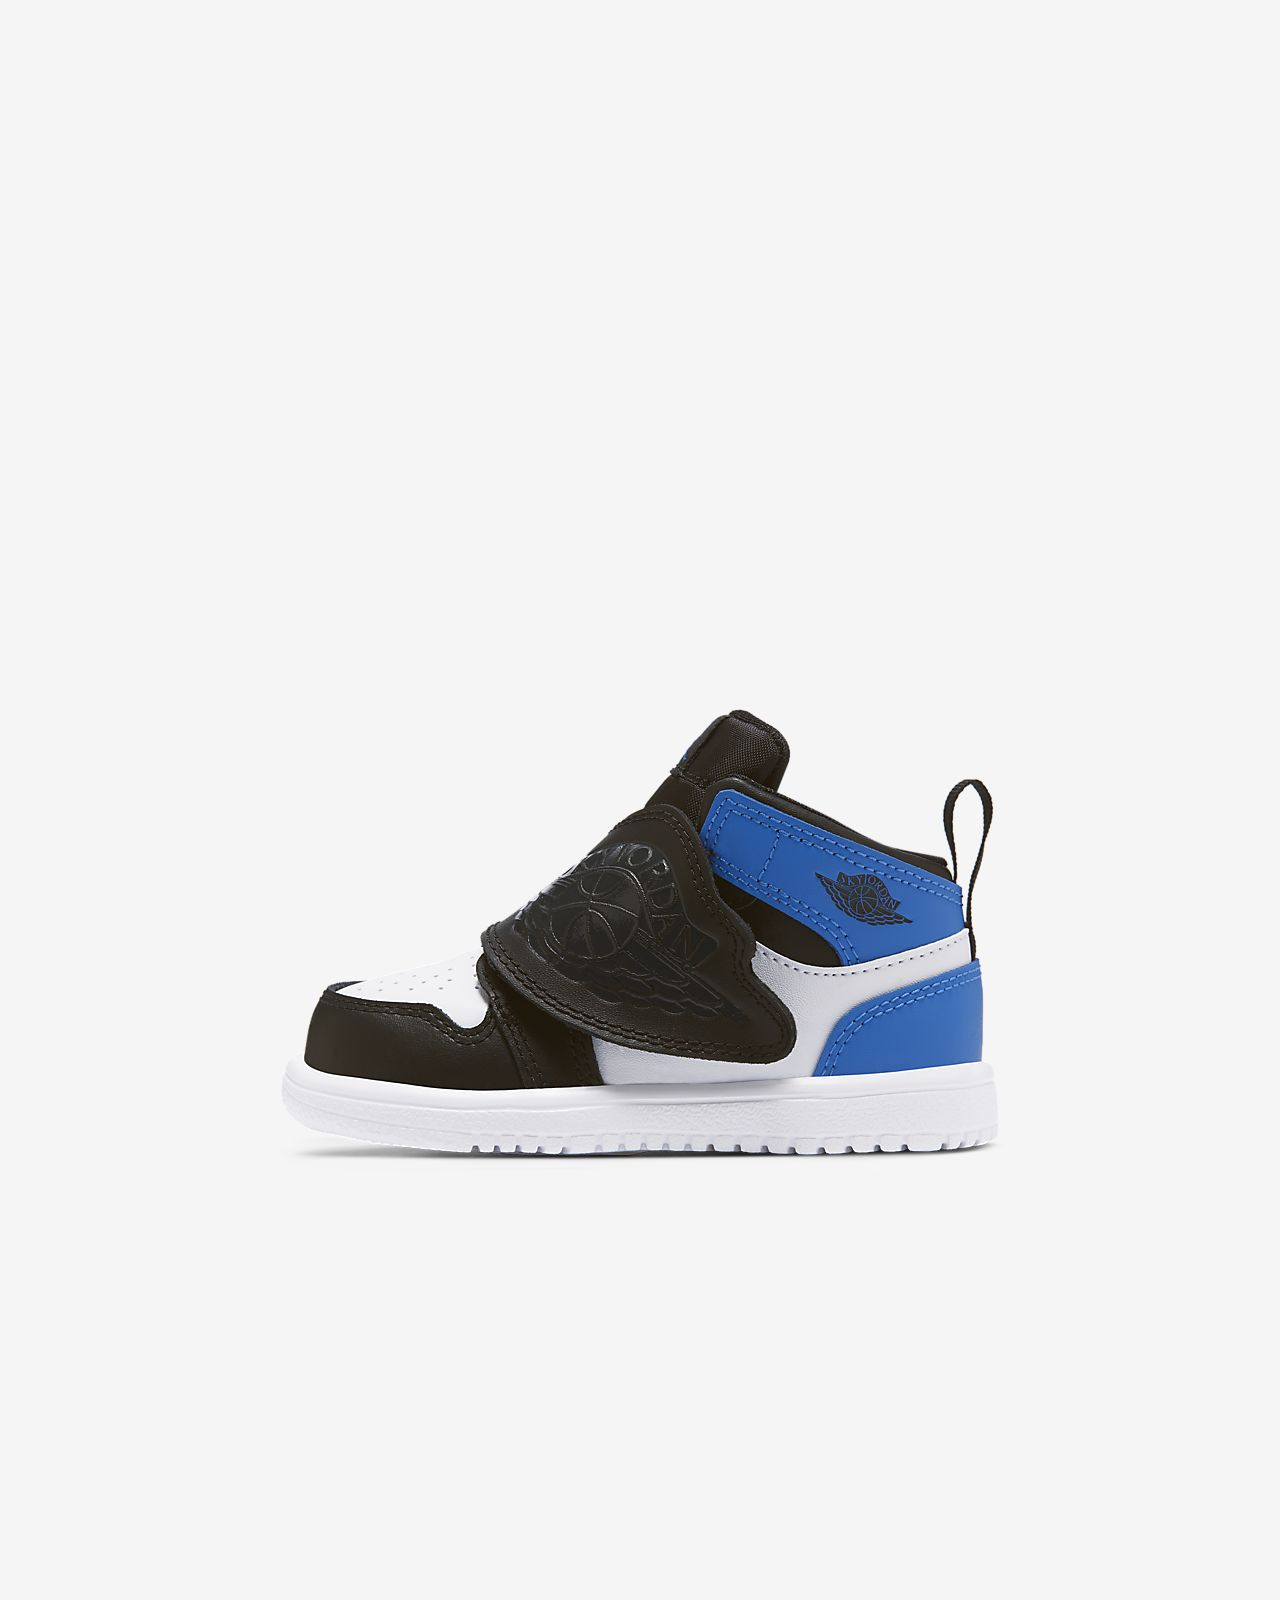 Sky Jordan 1 Baby/Toddler Shoe